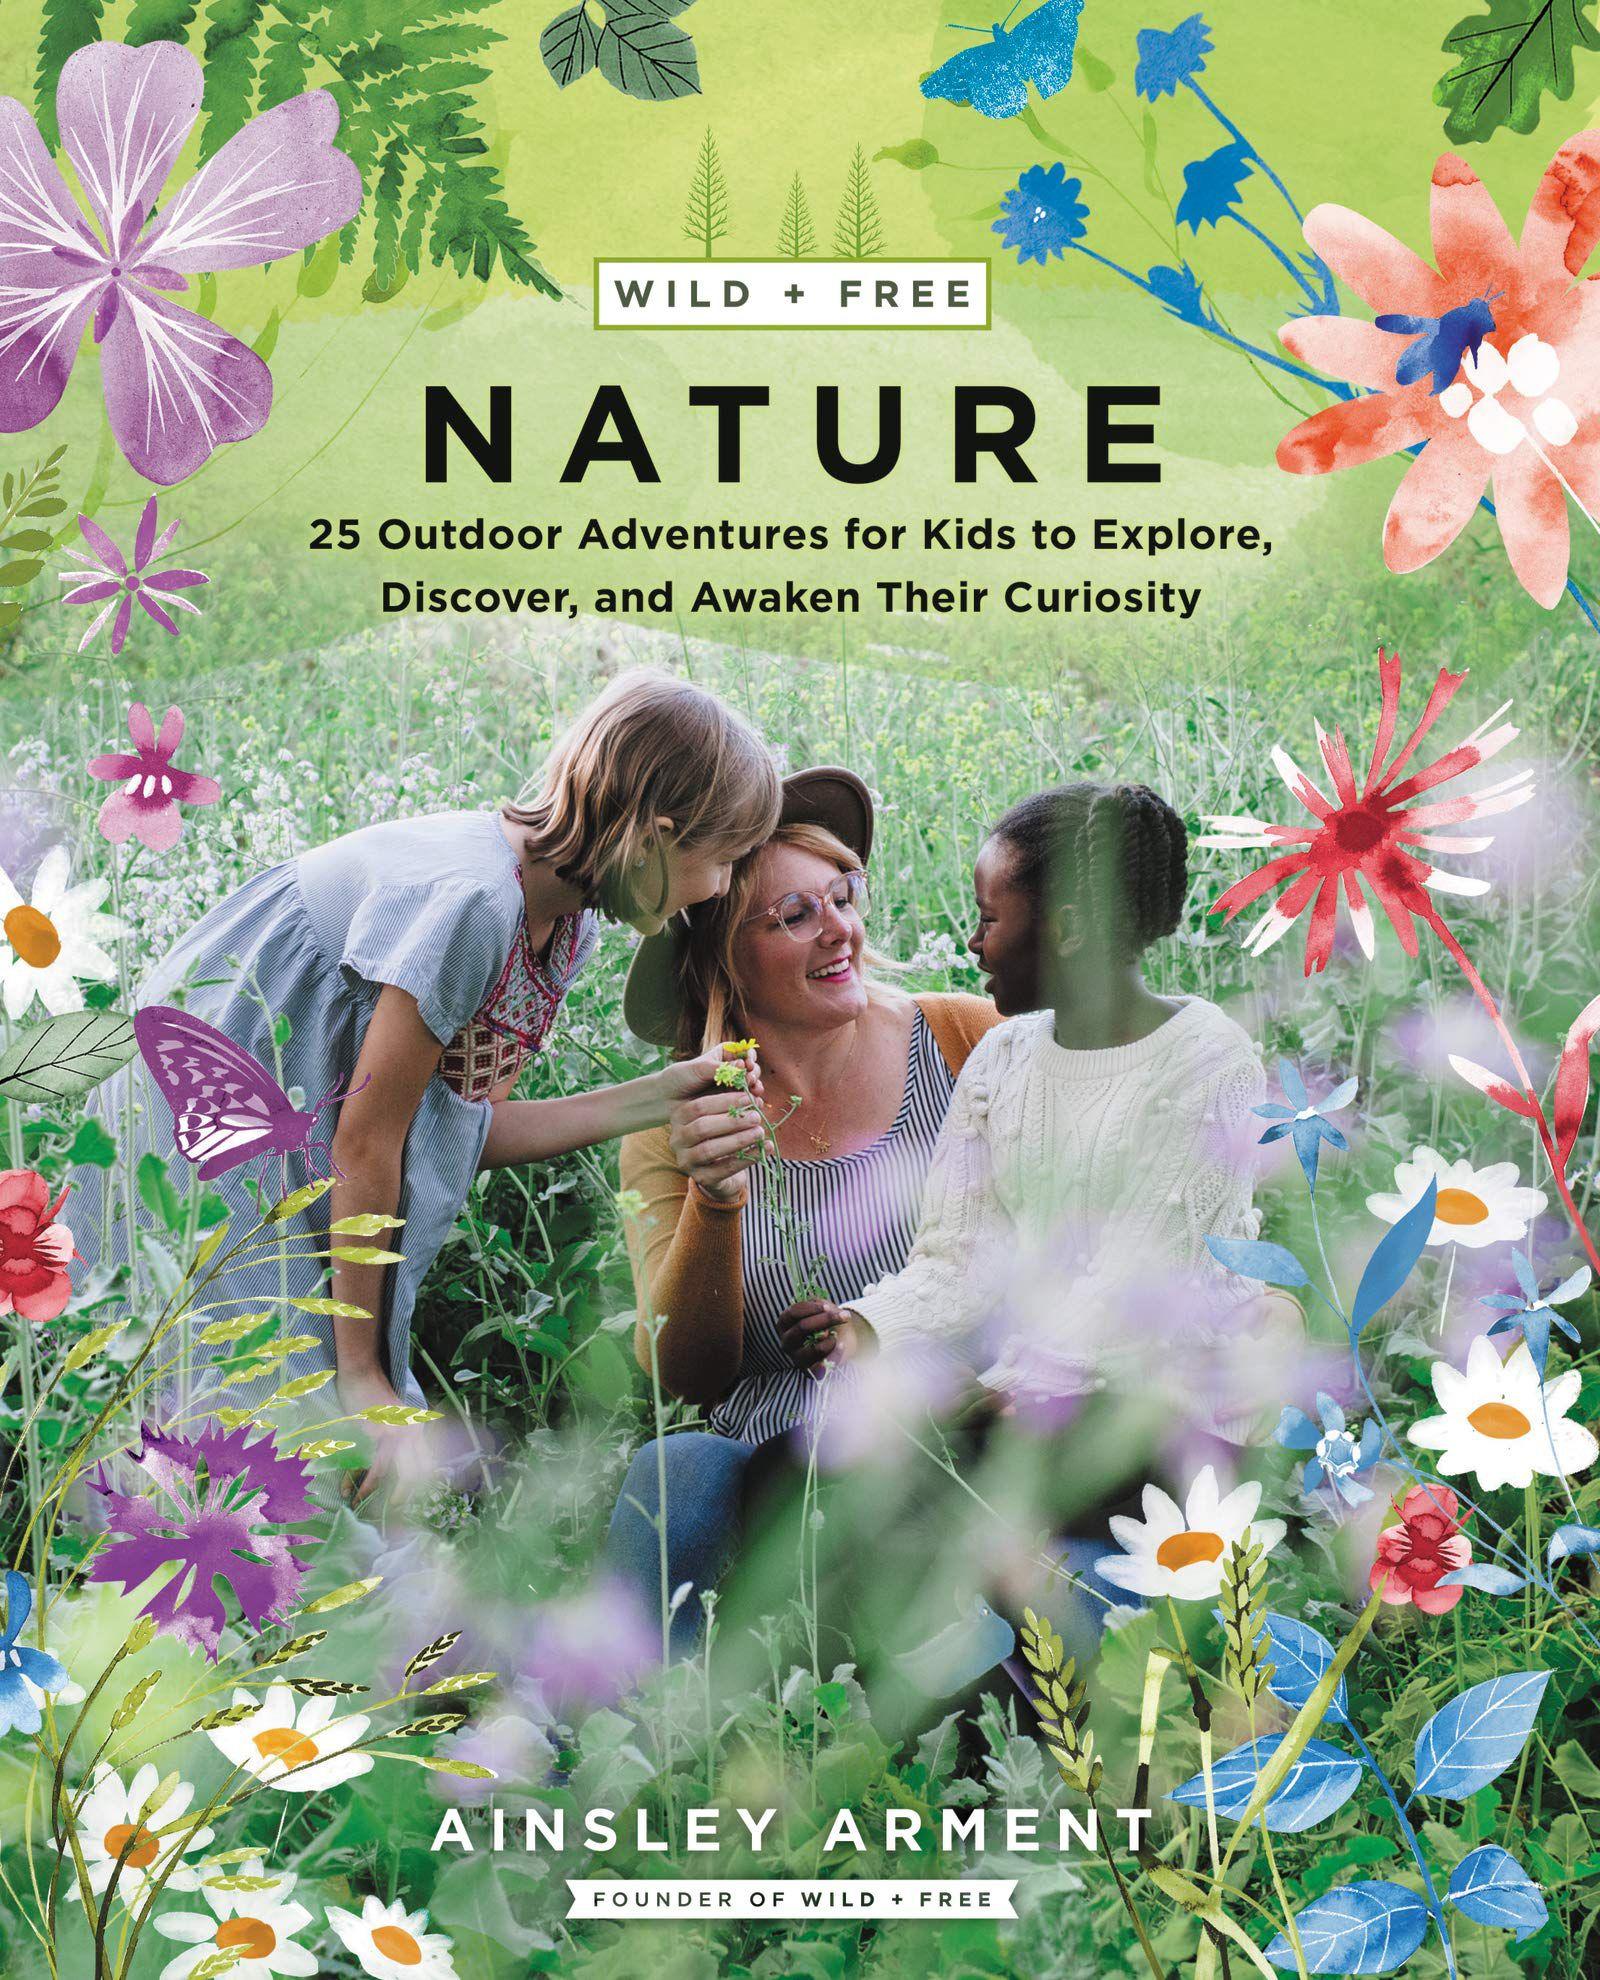 Wild + Free: Nature book cover